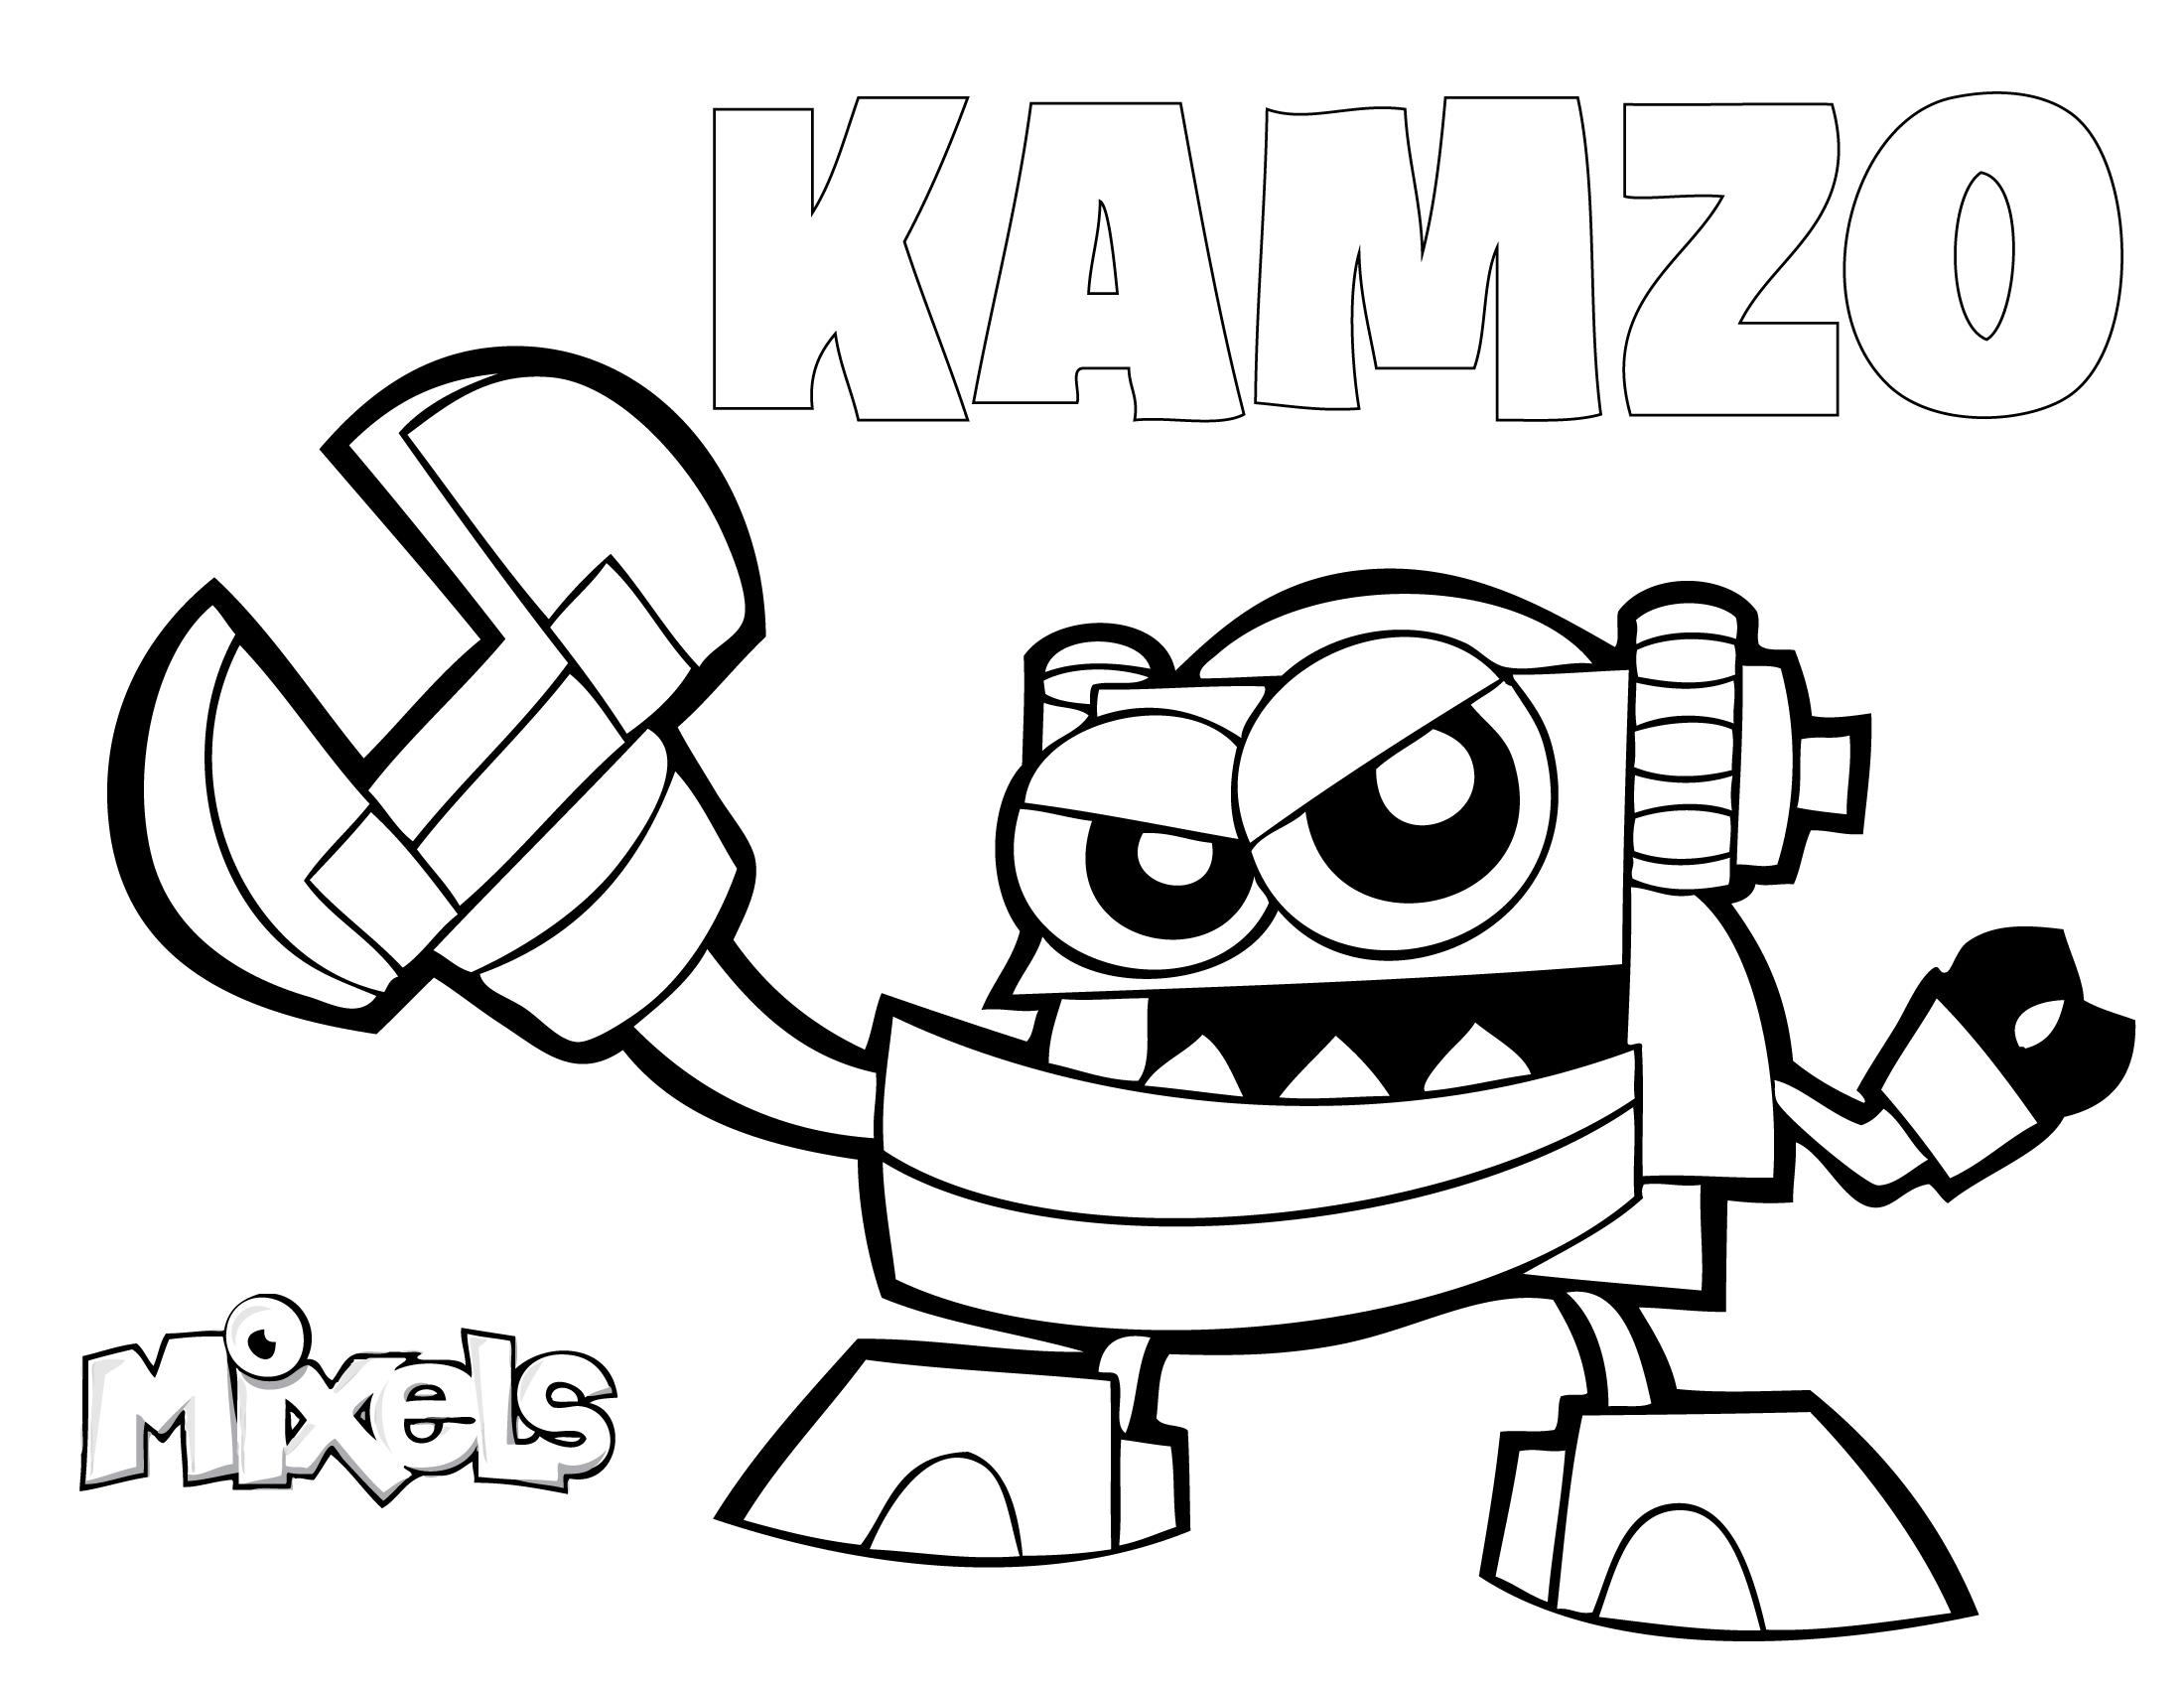 Mixels Kamzo Coloring Pages Educative Printable In 2020 Lego Coloring Pages Coloring Pages Lego Coloring